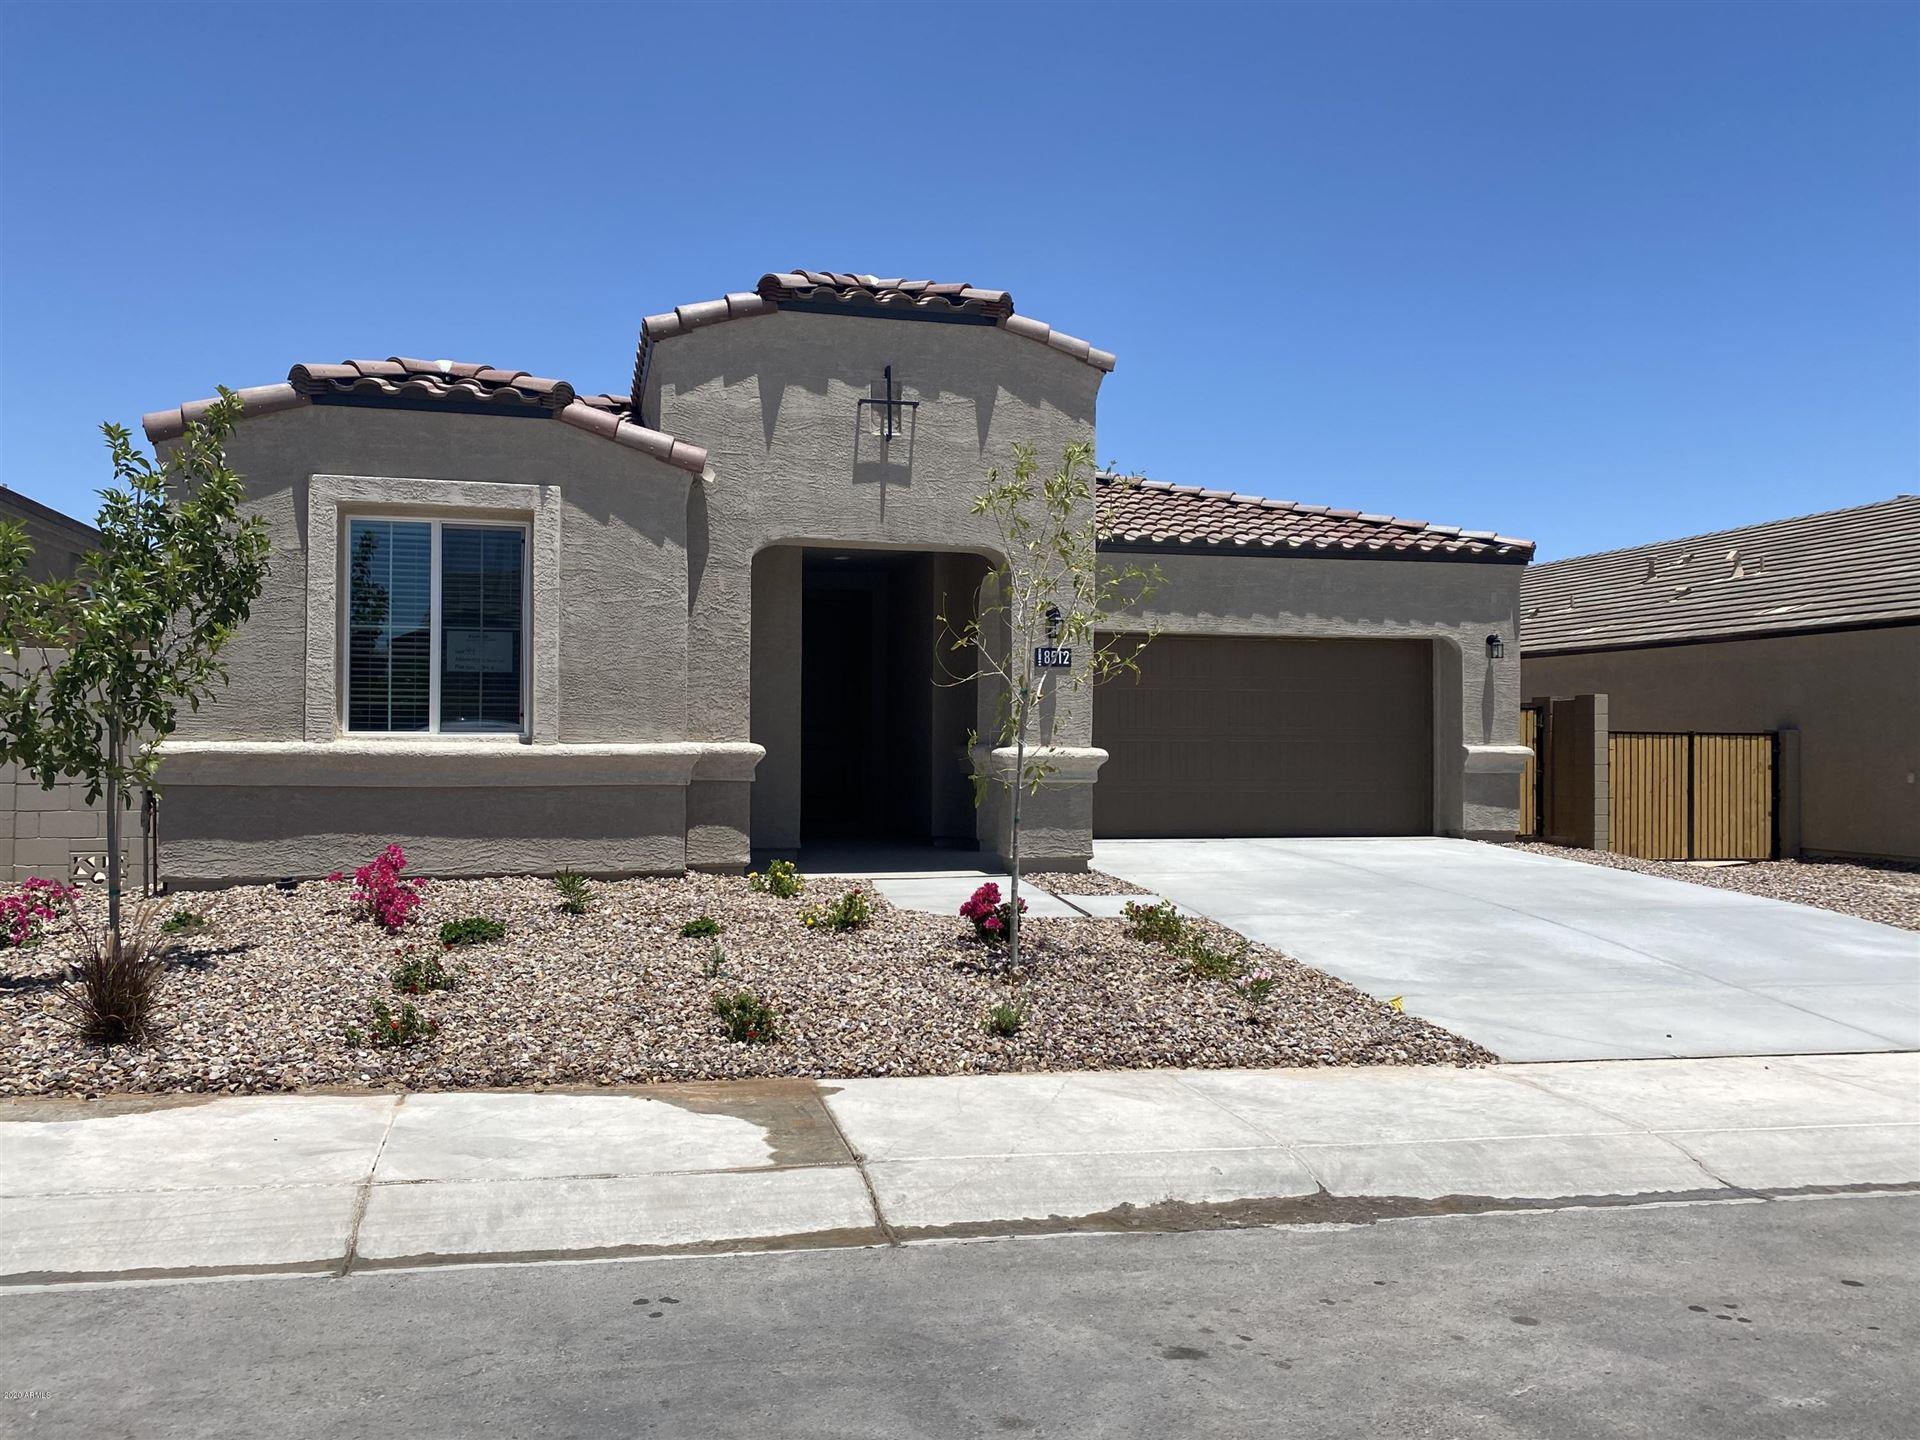 8512 W SONOMA Way, Florence, AZ 85132 - MLS#: 6097715